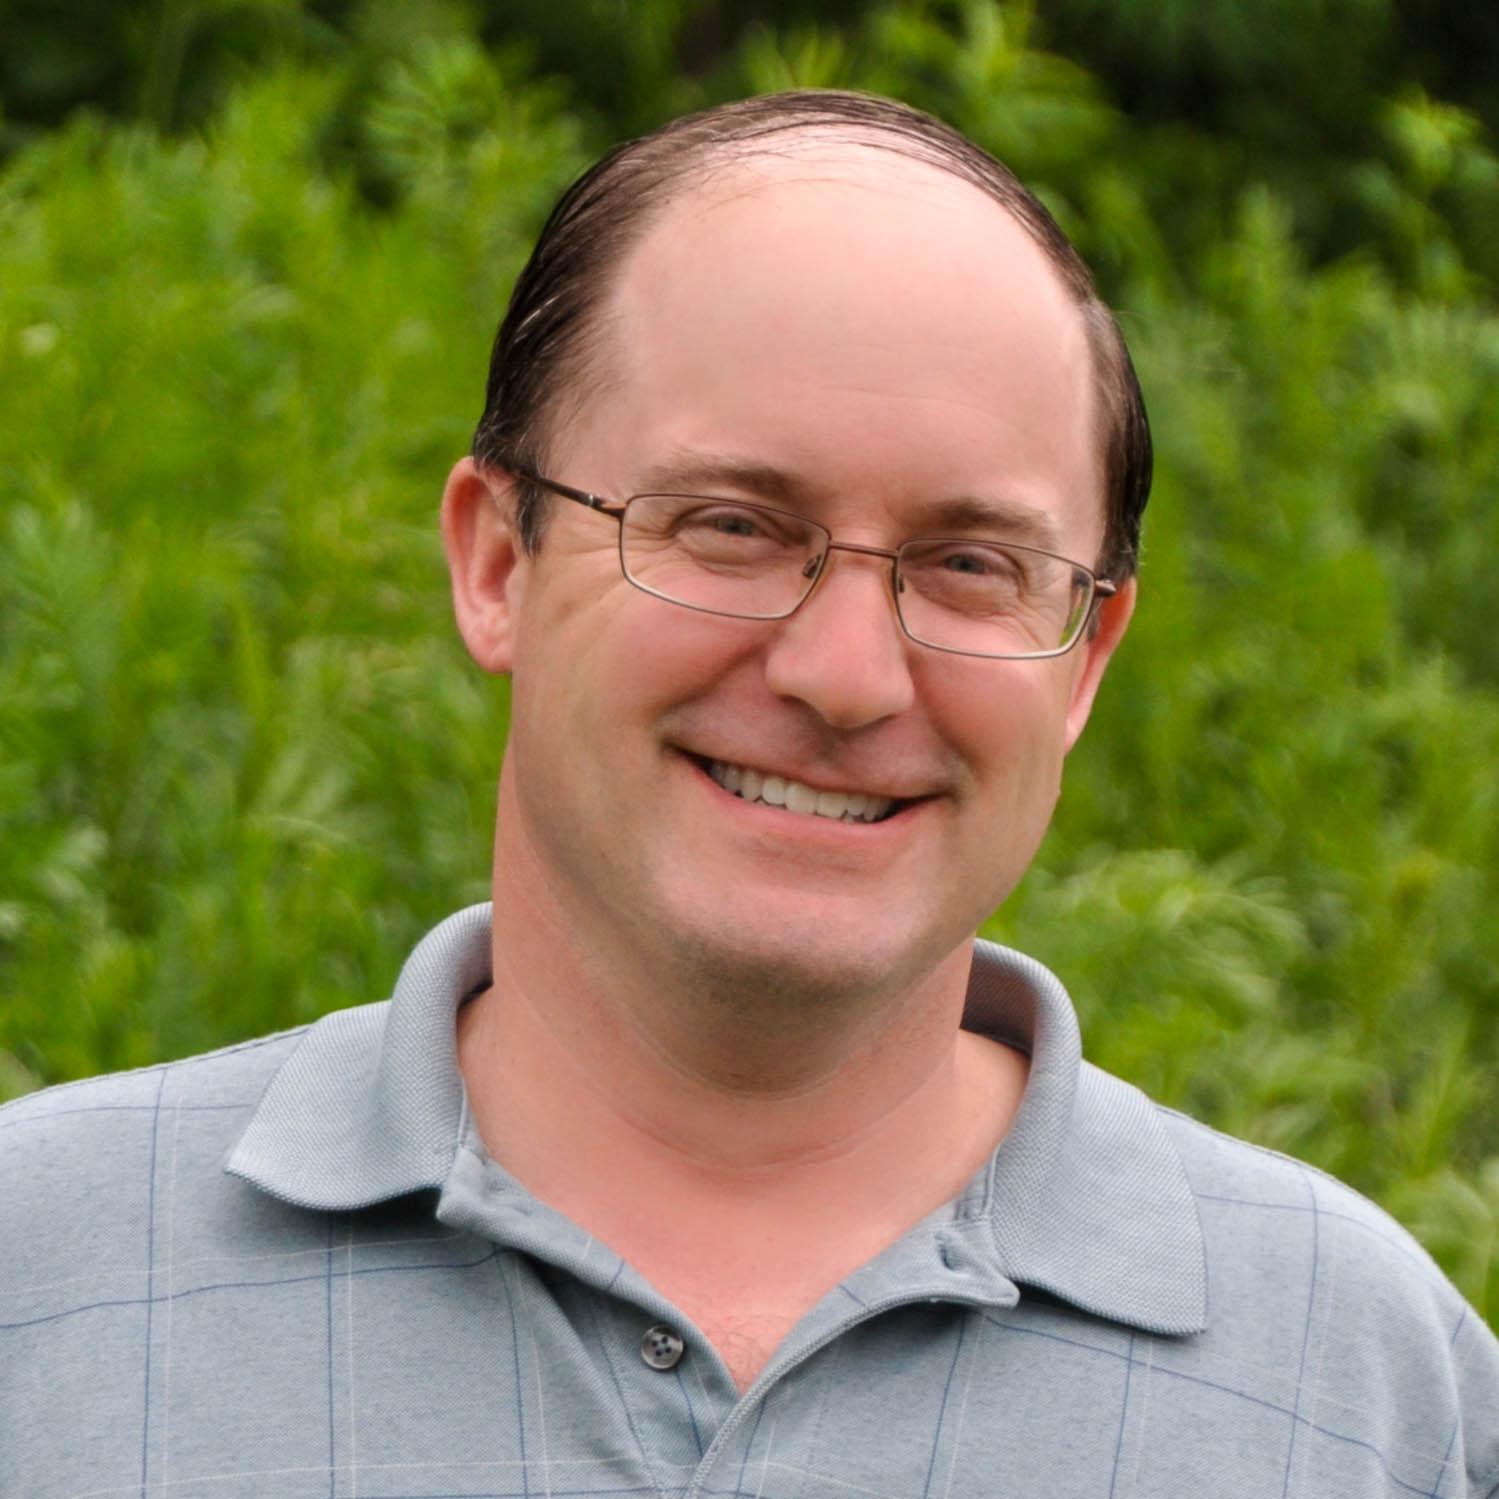 Craig Habighorst